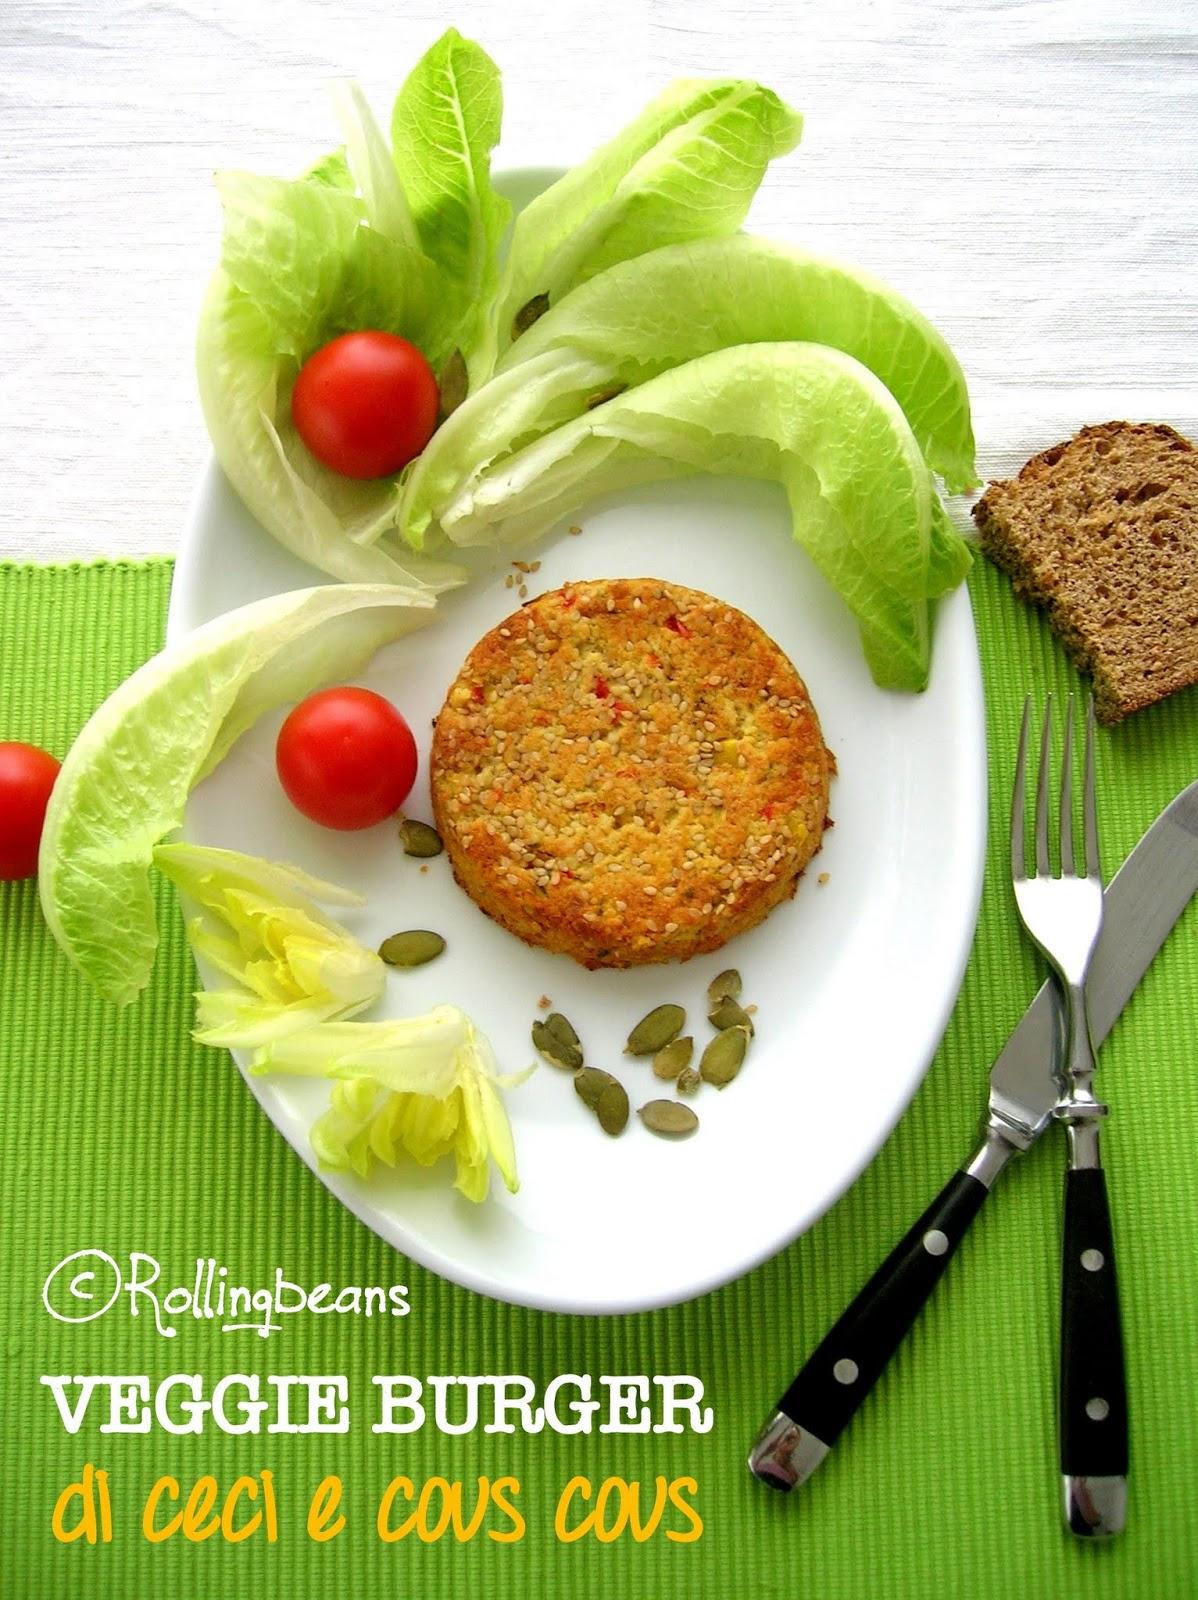 veggie burger di ceci e cous cous (vegan)